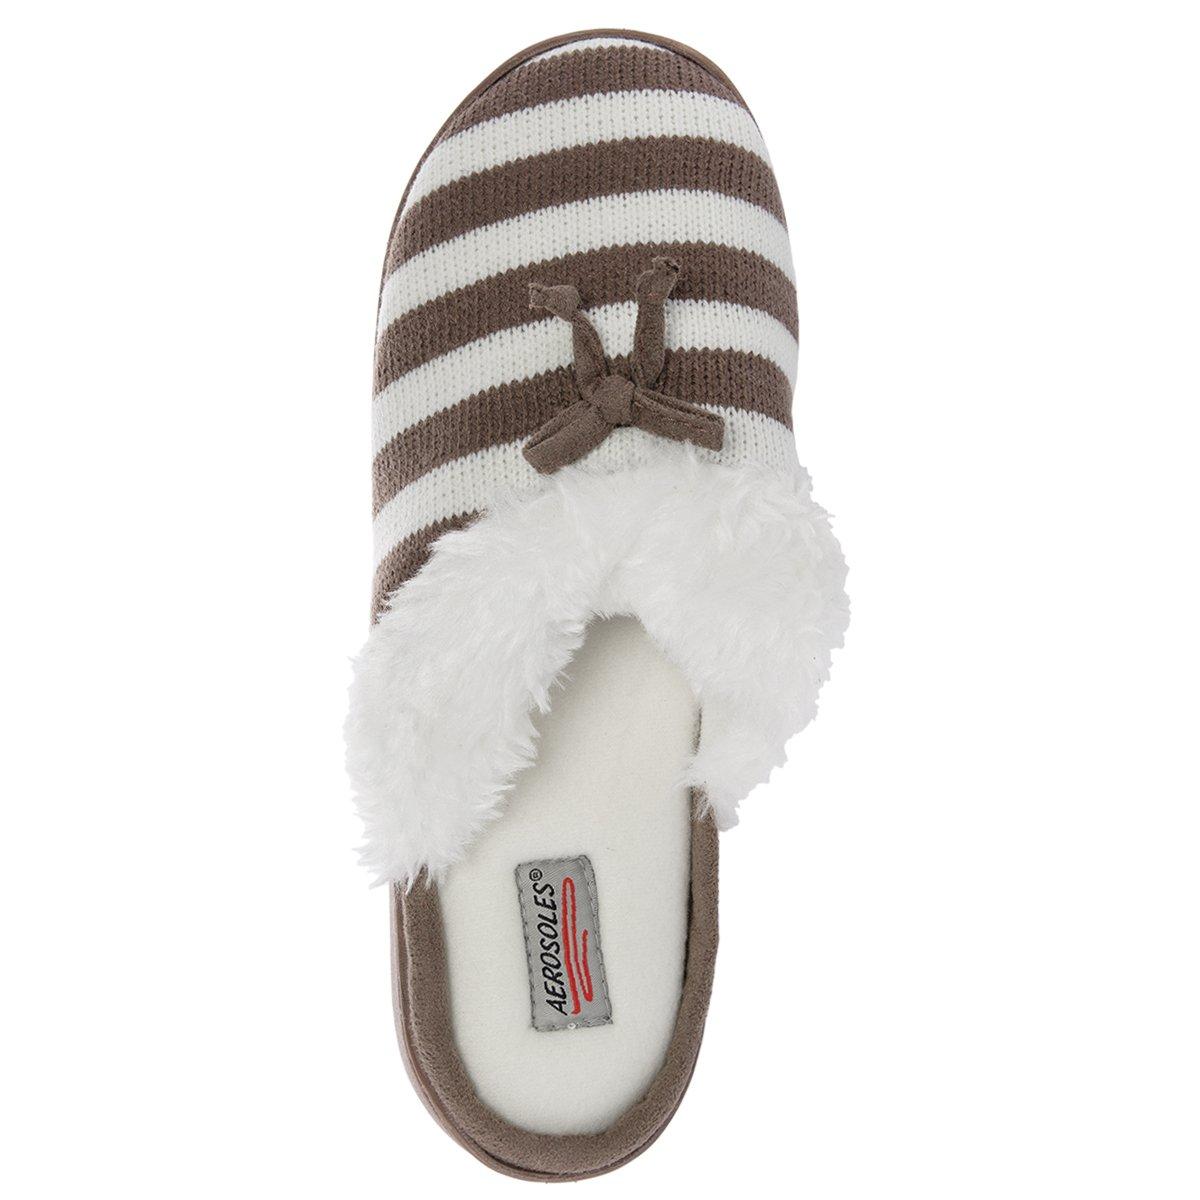 4dd4ac73e40 Amazon.com  Aerosoles Comfy Cushioned House Slippers For Women